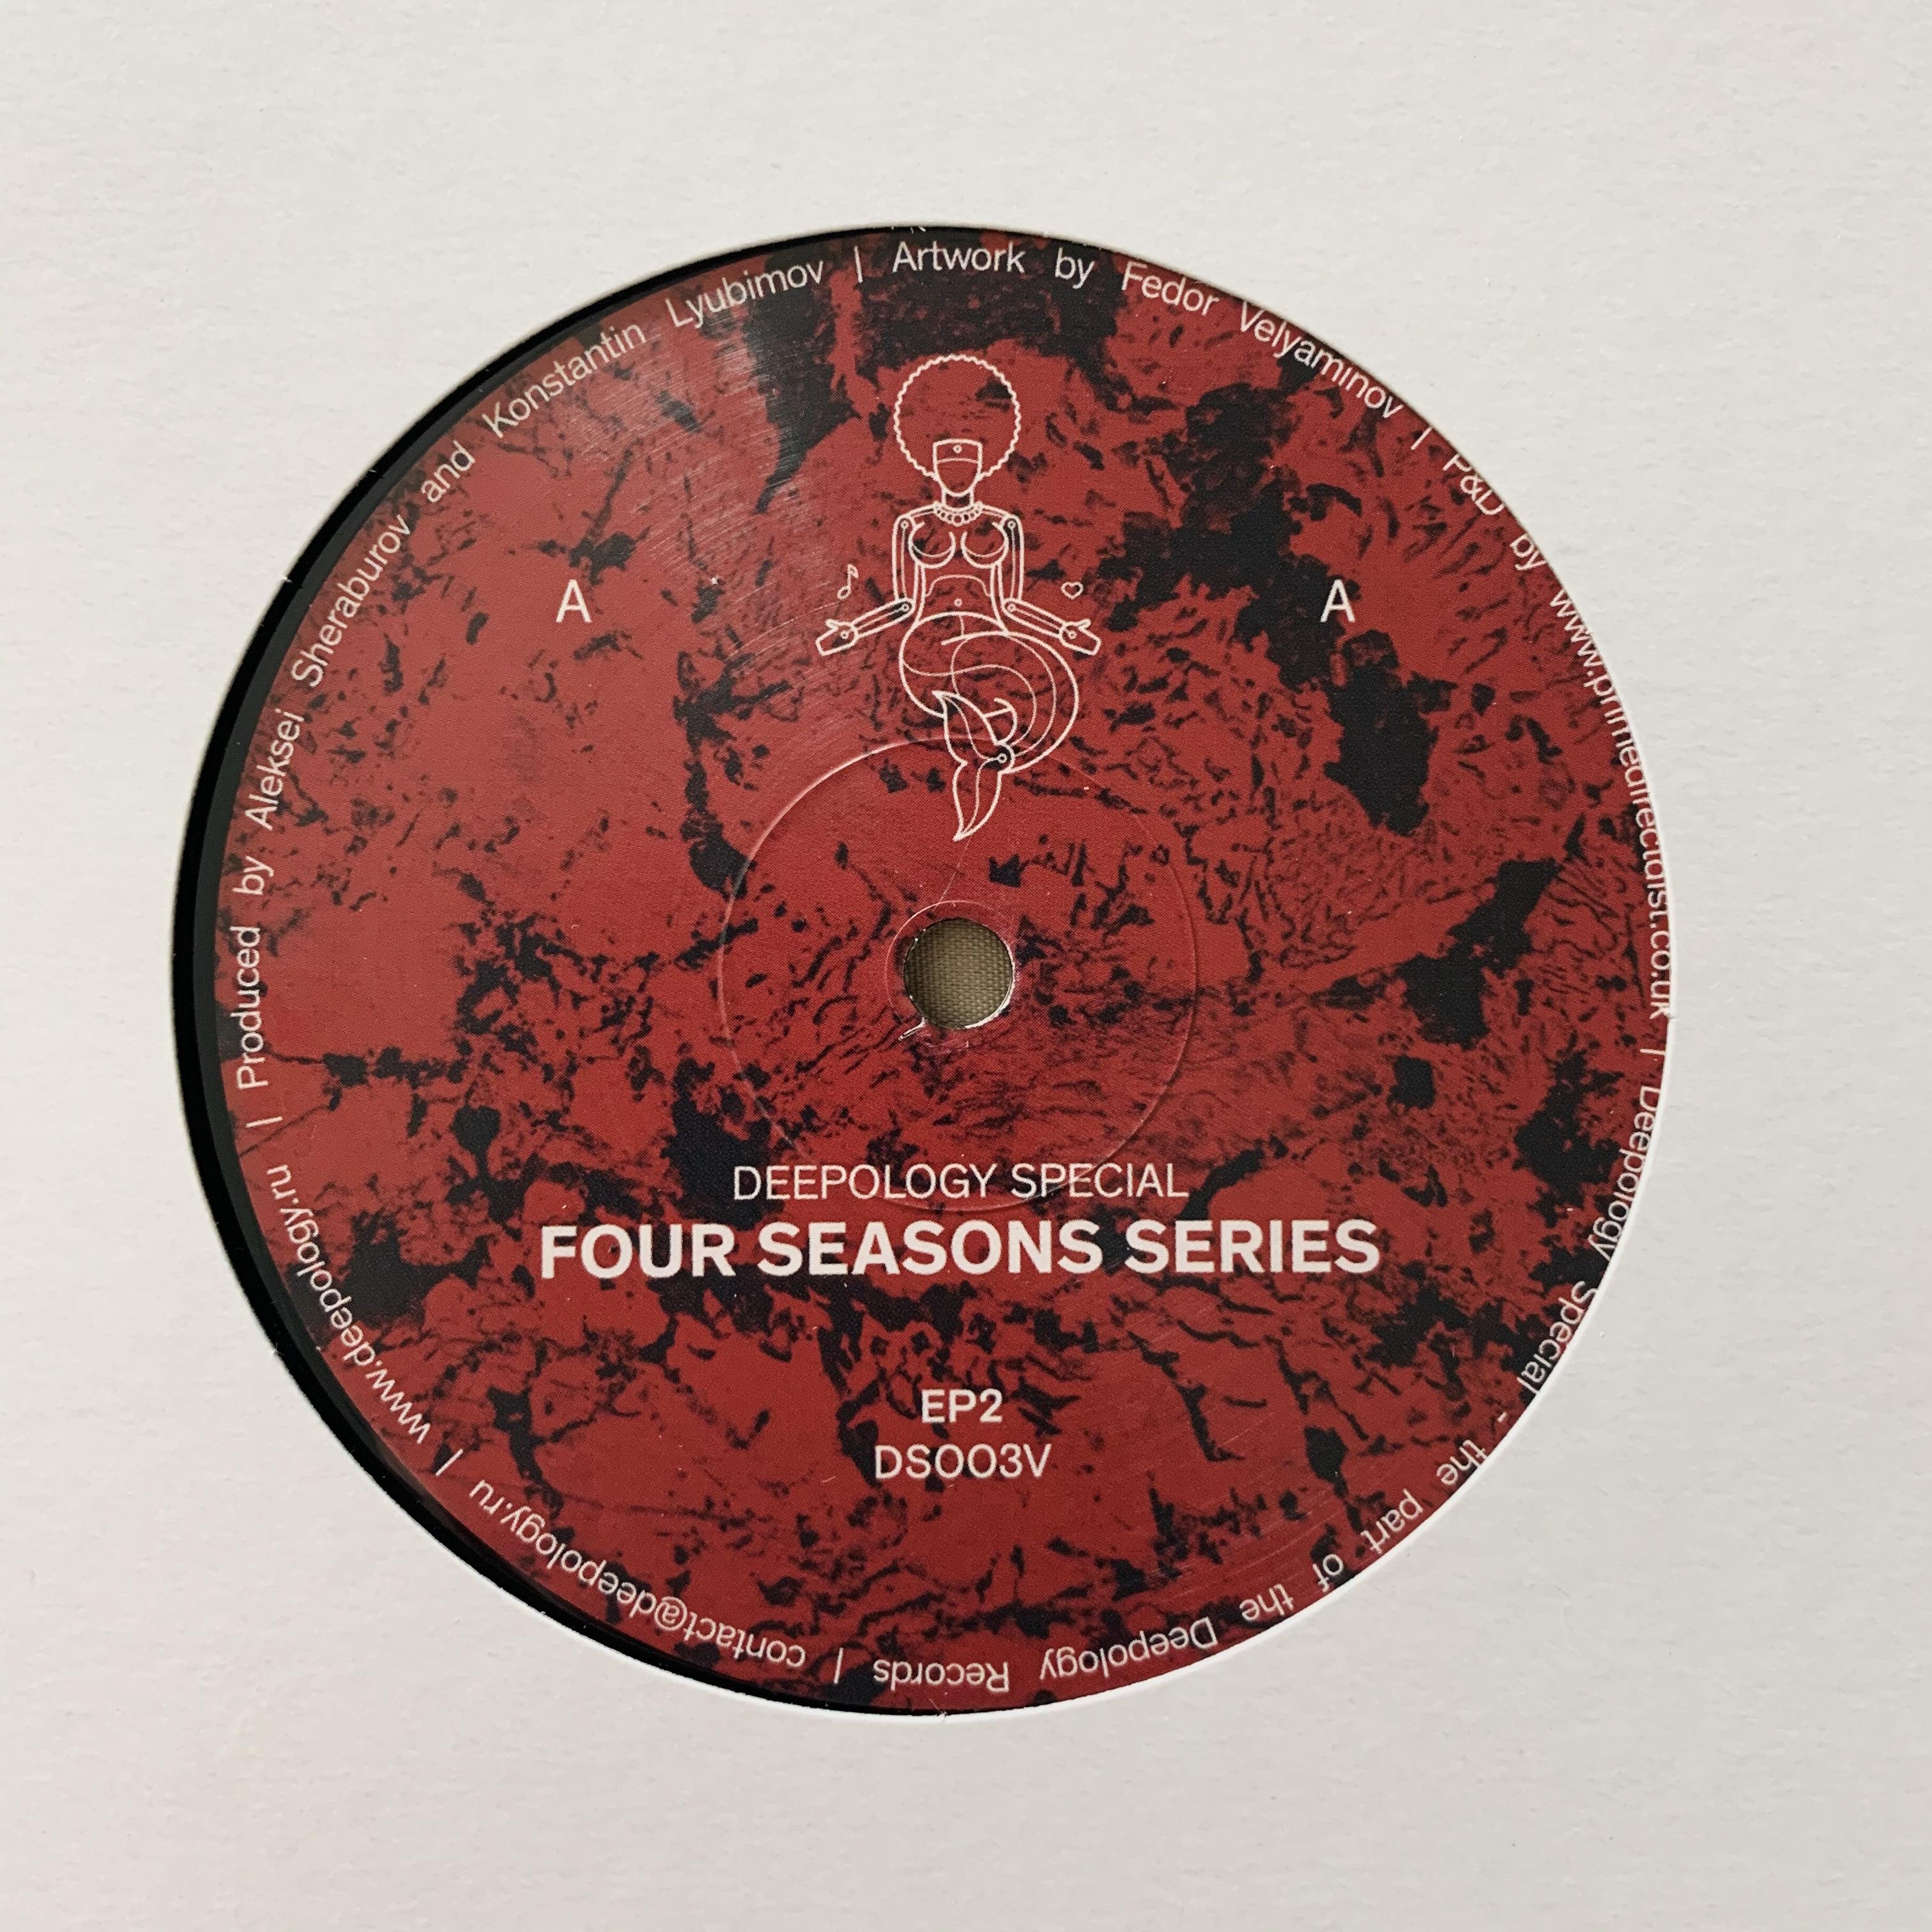 Four Seasons Series EP 2 Image